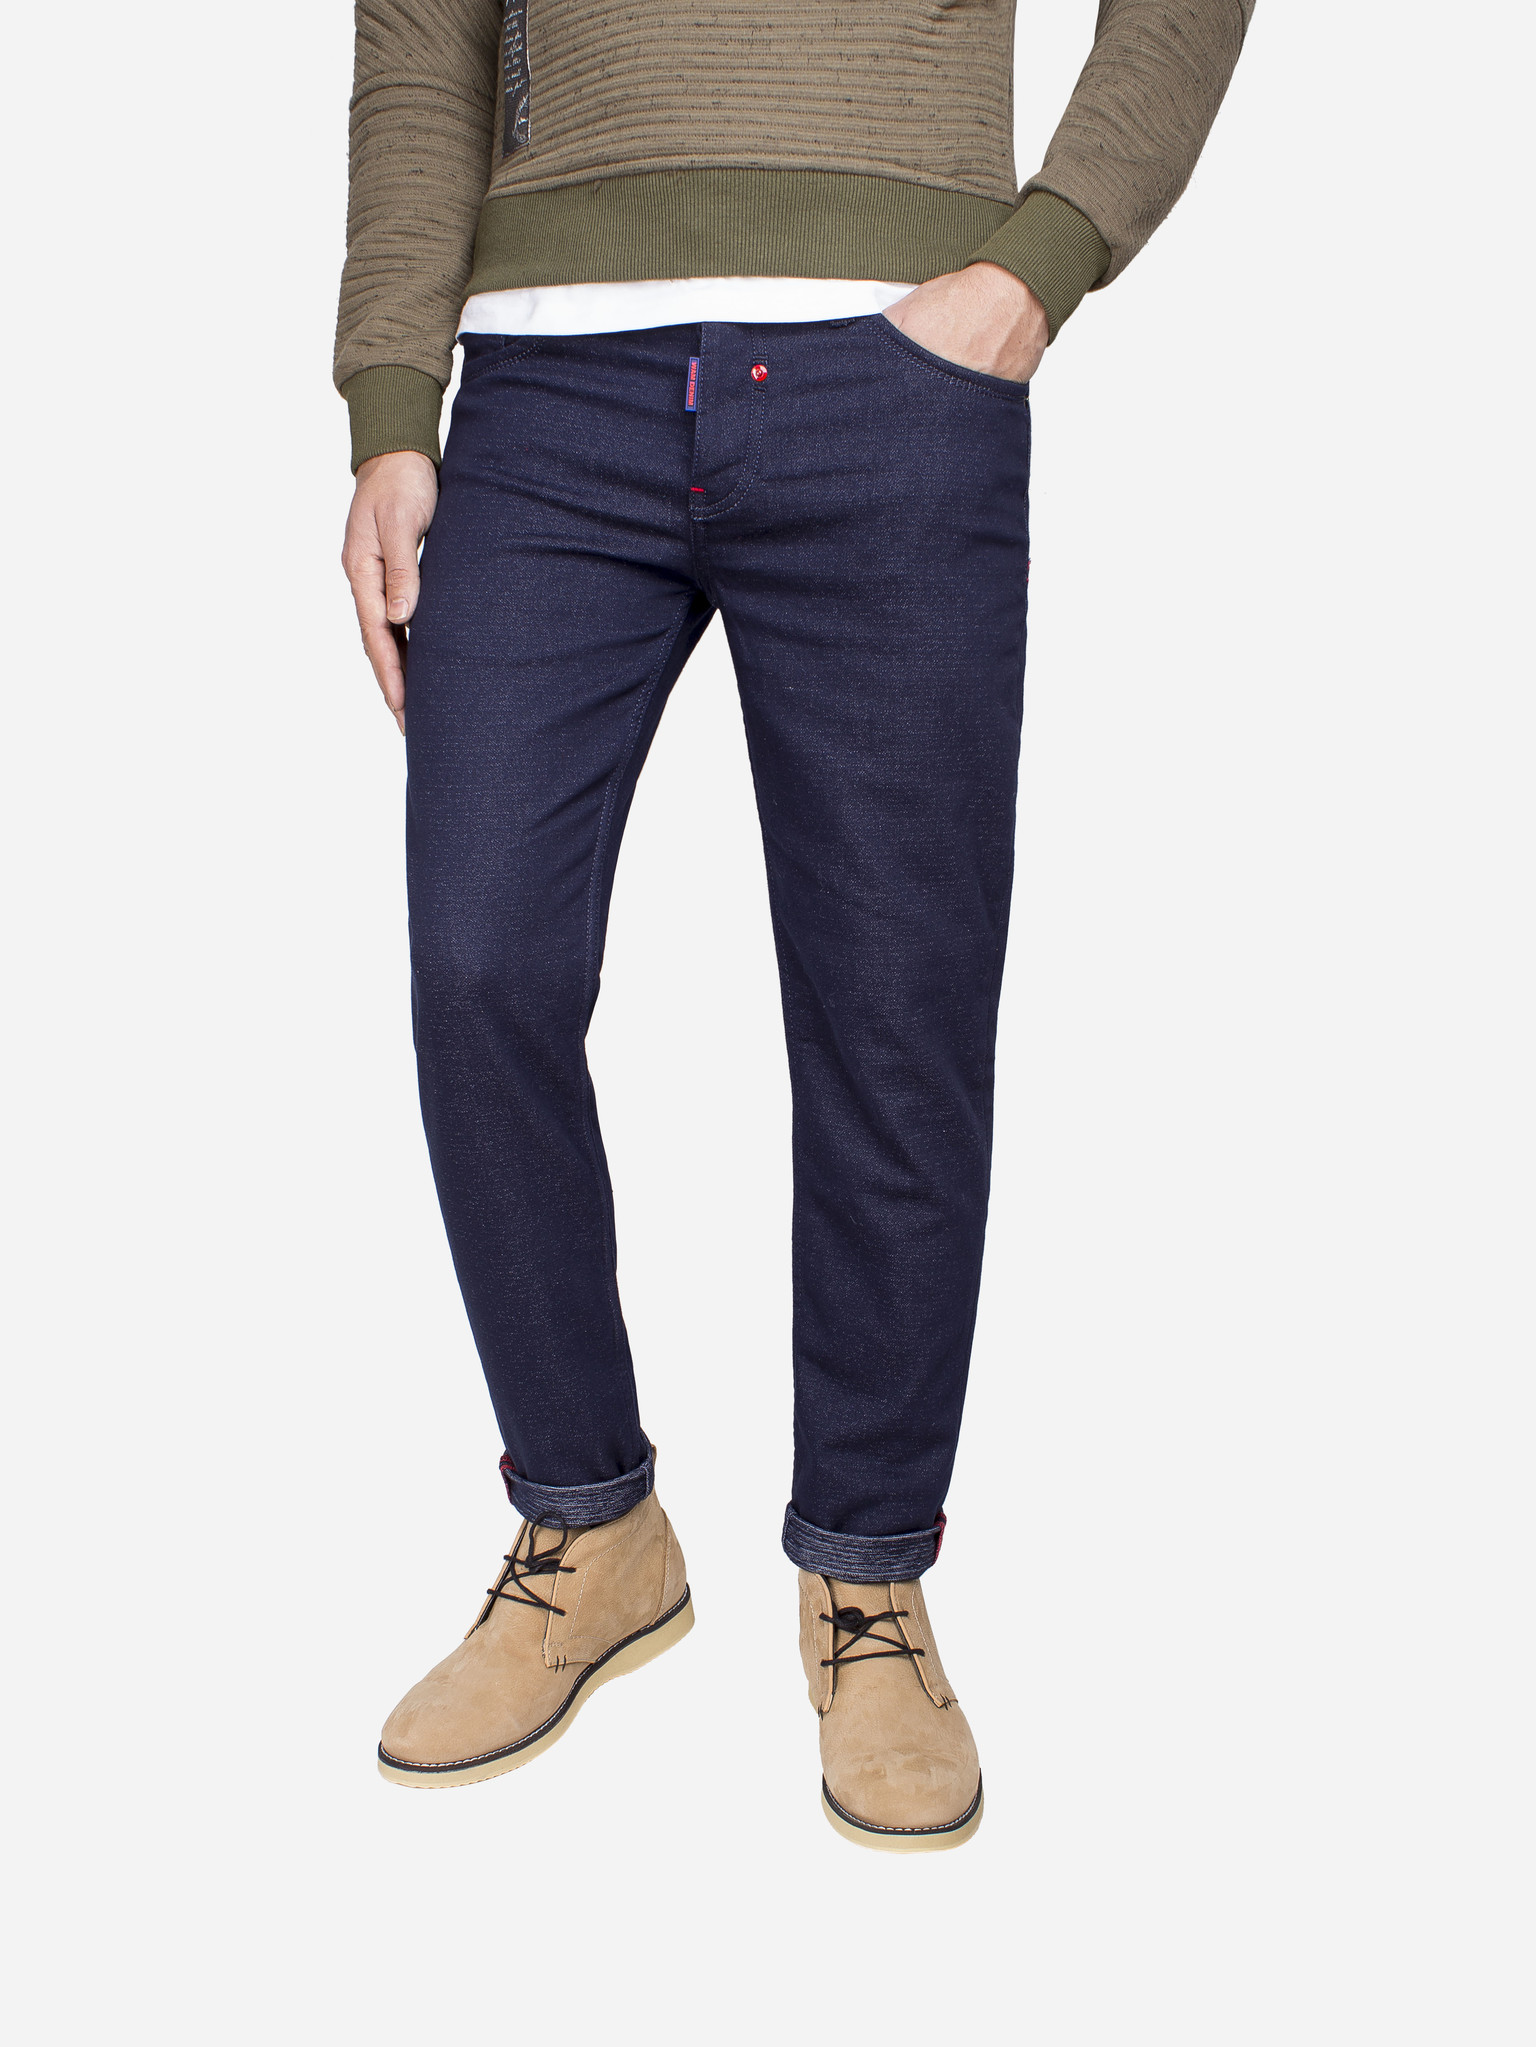 Wam Denim Jeans  Maat: 29/34